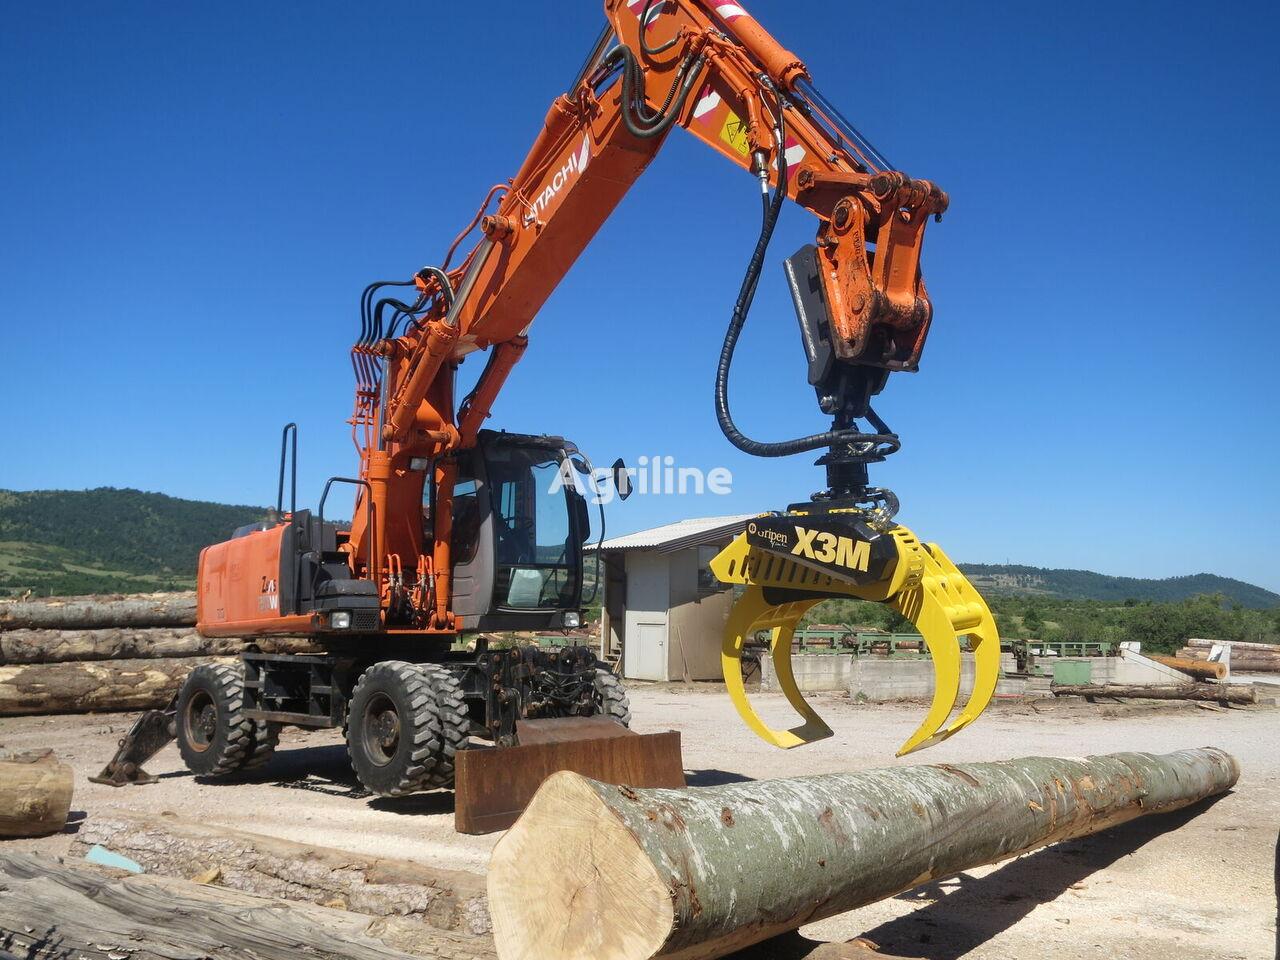 X3M pinza para troncos nuevo